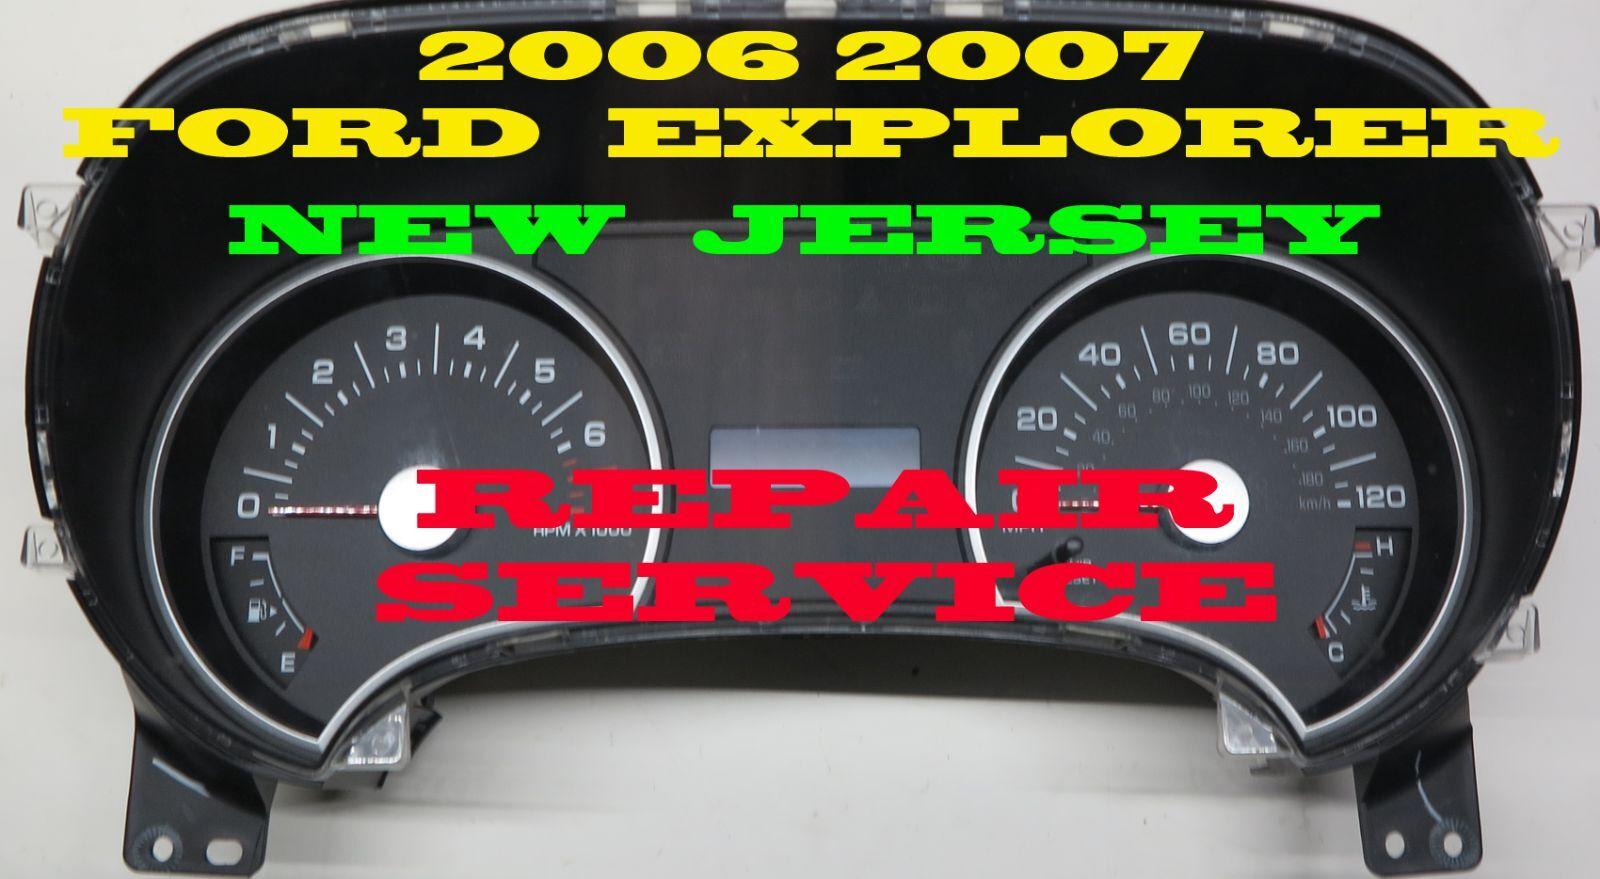 FITS 06 07 2006 2007 FORD EXPLORER CLUSTER INFO TRANSFER (MILEAGE ,VIN#, HOURS